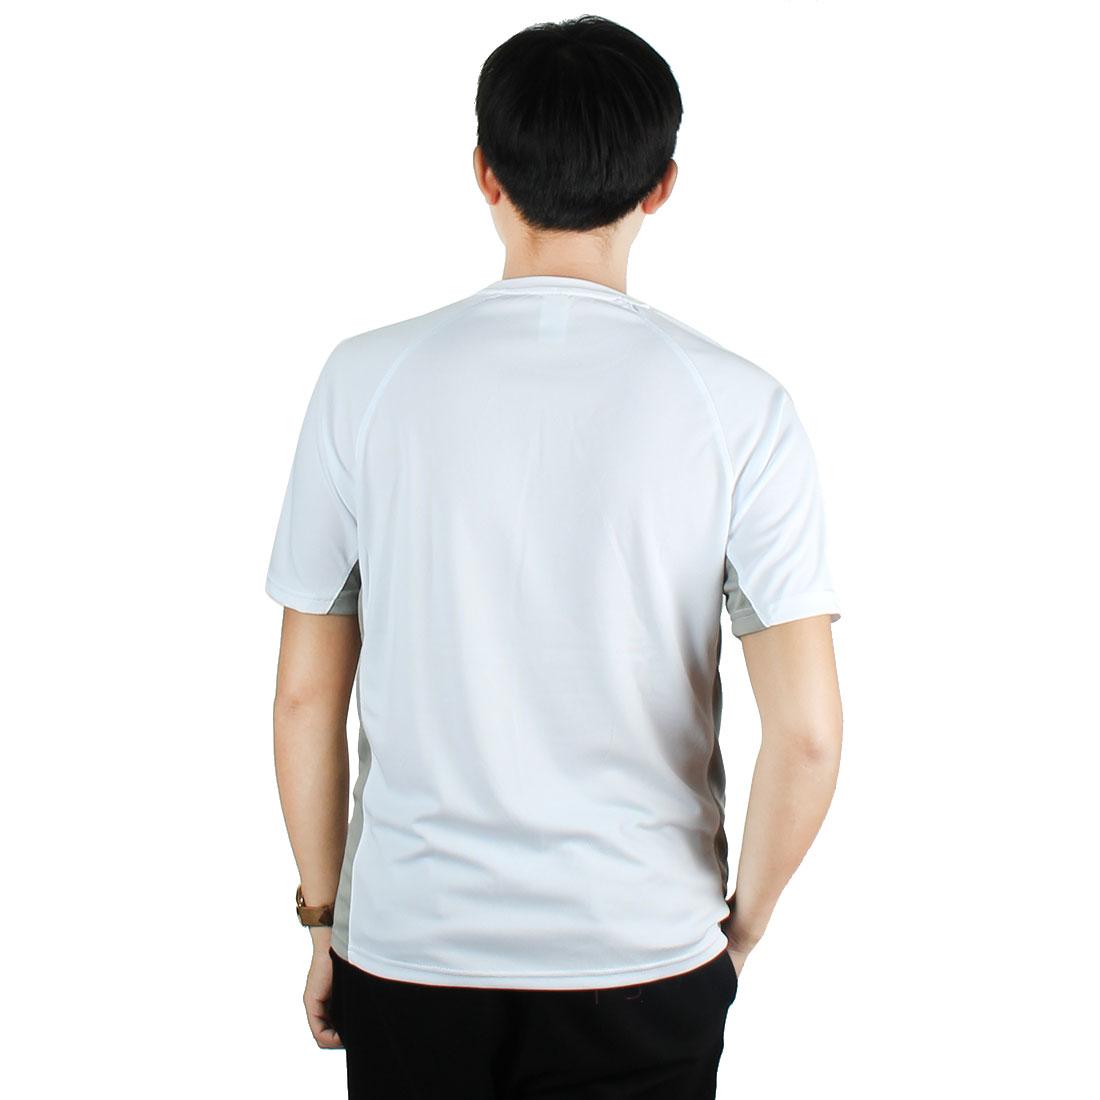 Men Exercise Marathon Polyester Short Sleeve Sports T-shirt White L/L (US 42) - image 2 de 6